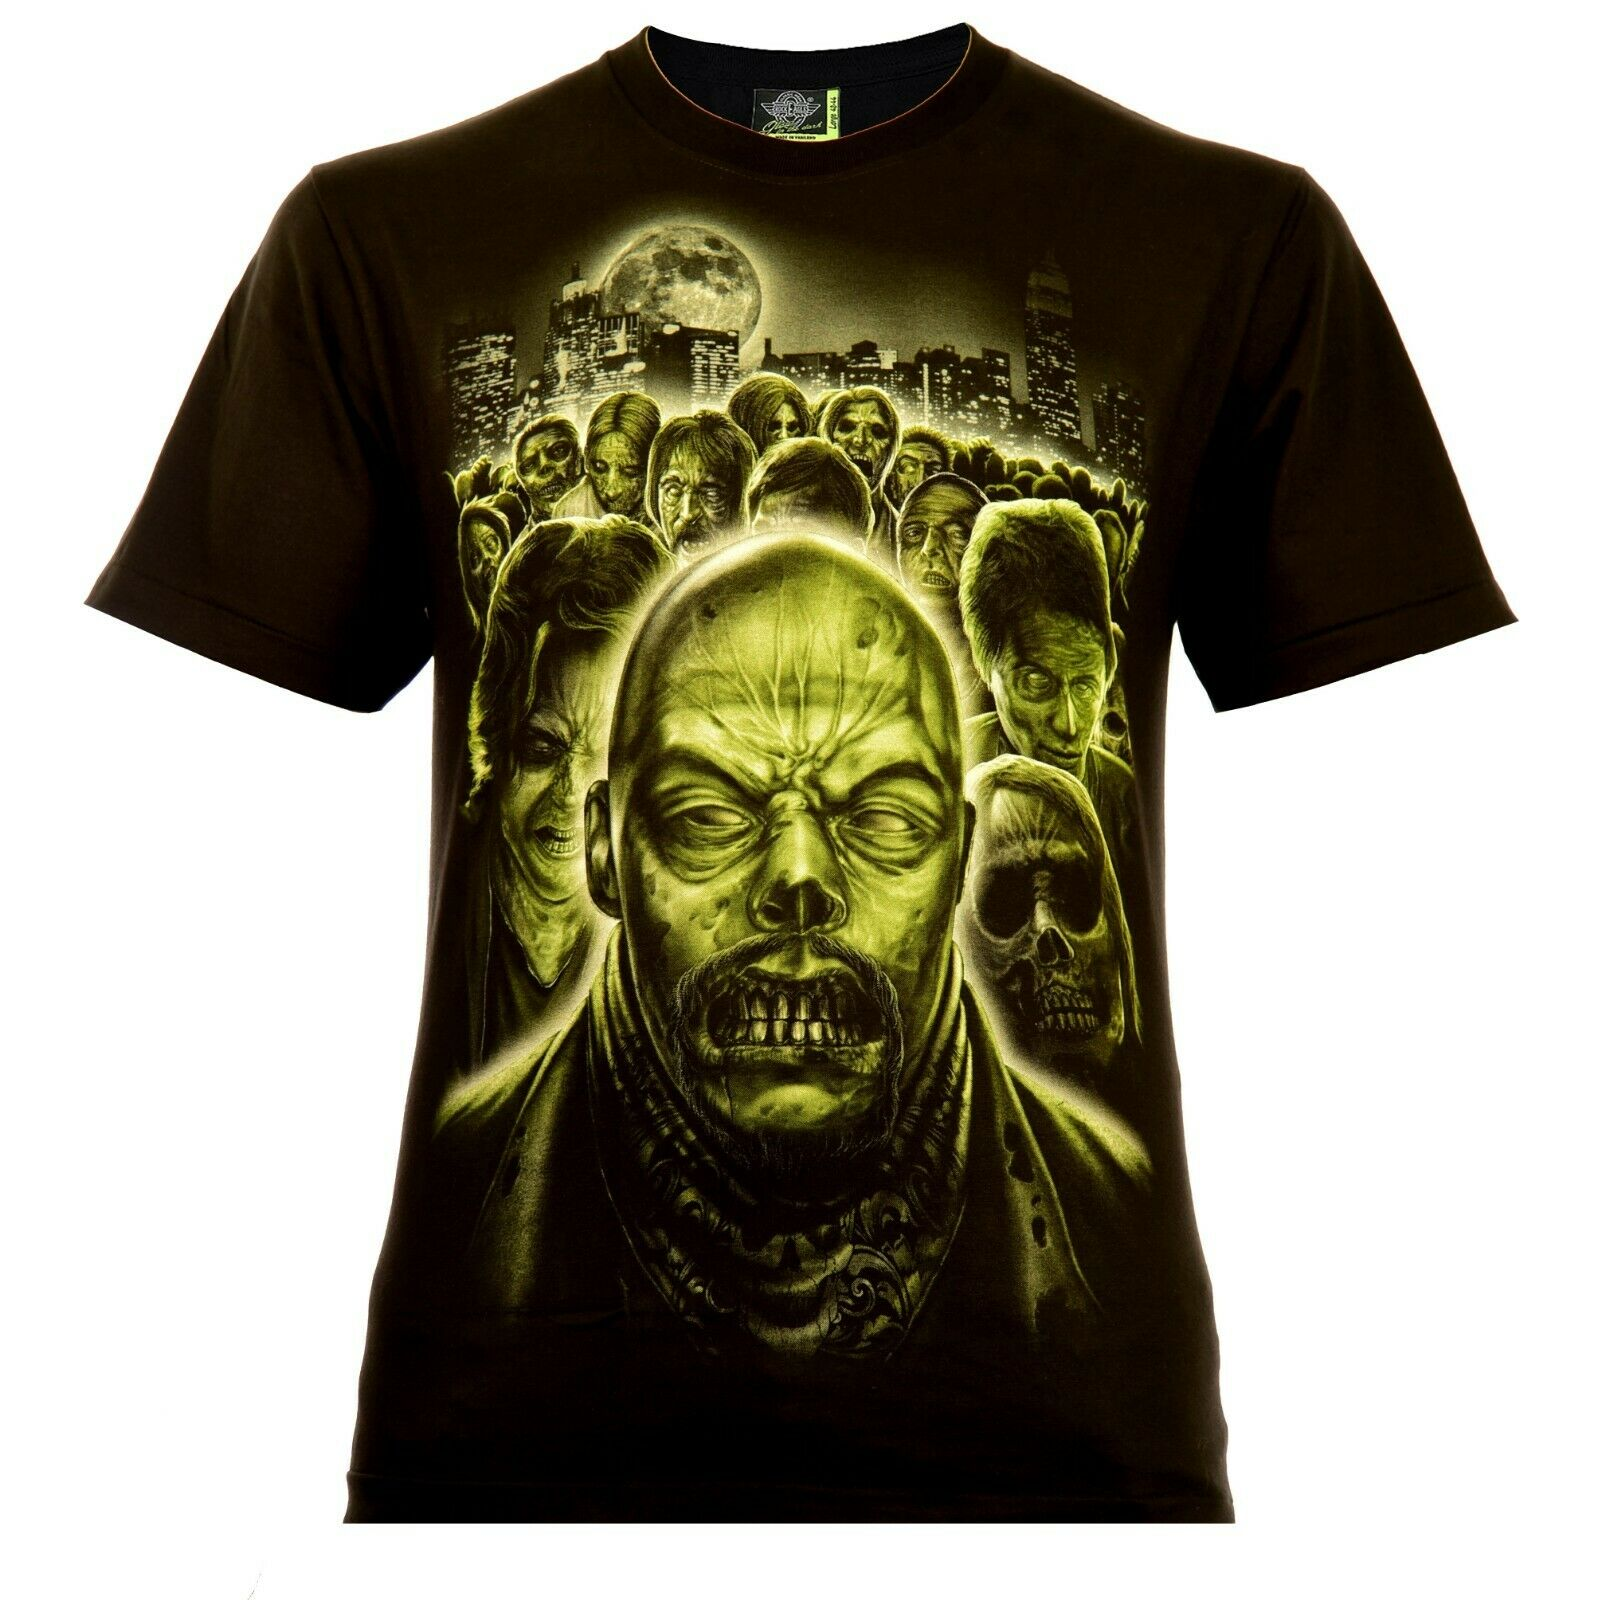 Rock Eagle Herren T-Shirt Schwarz Zombie Invasion Glow in the Dark Totenkopf